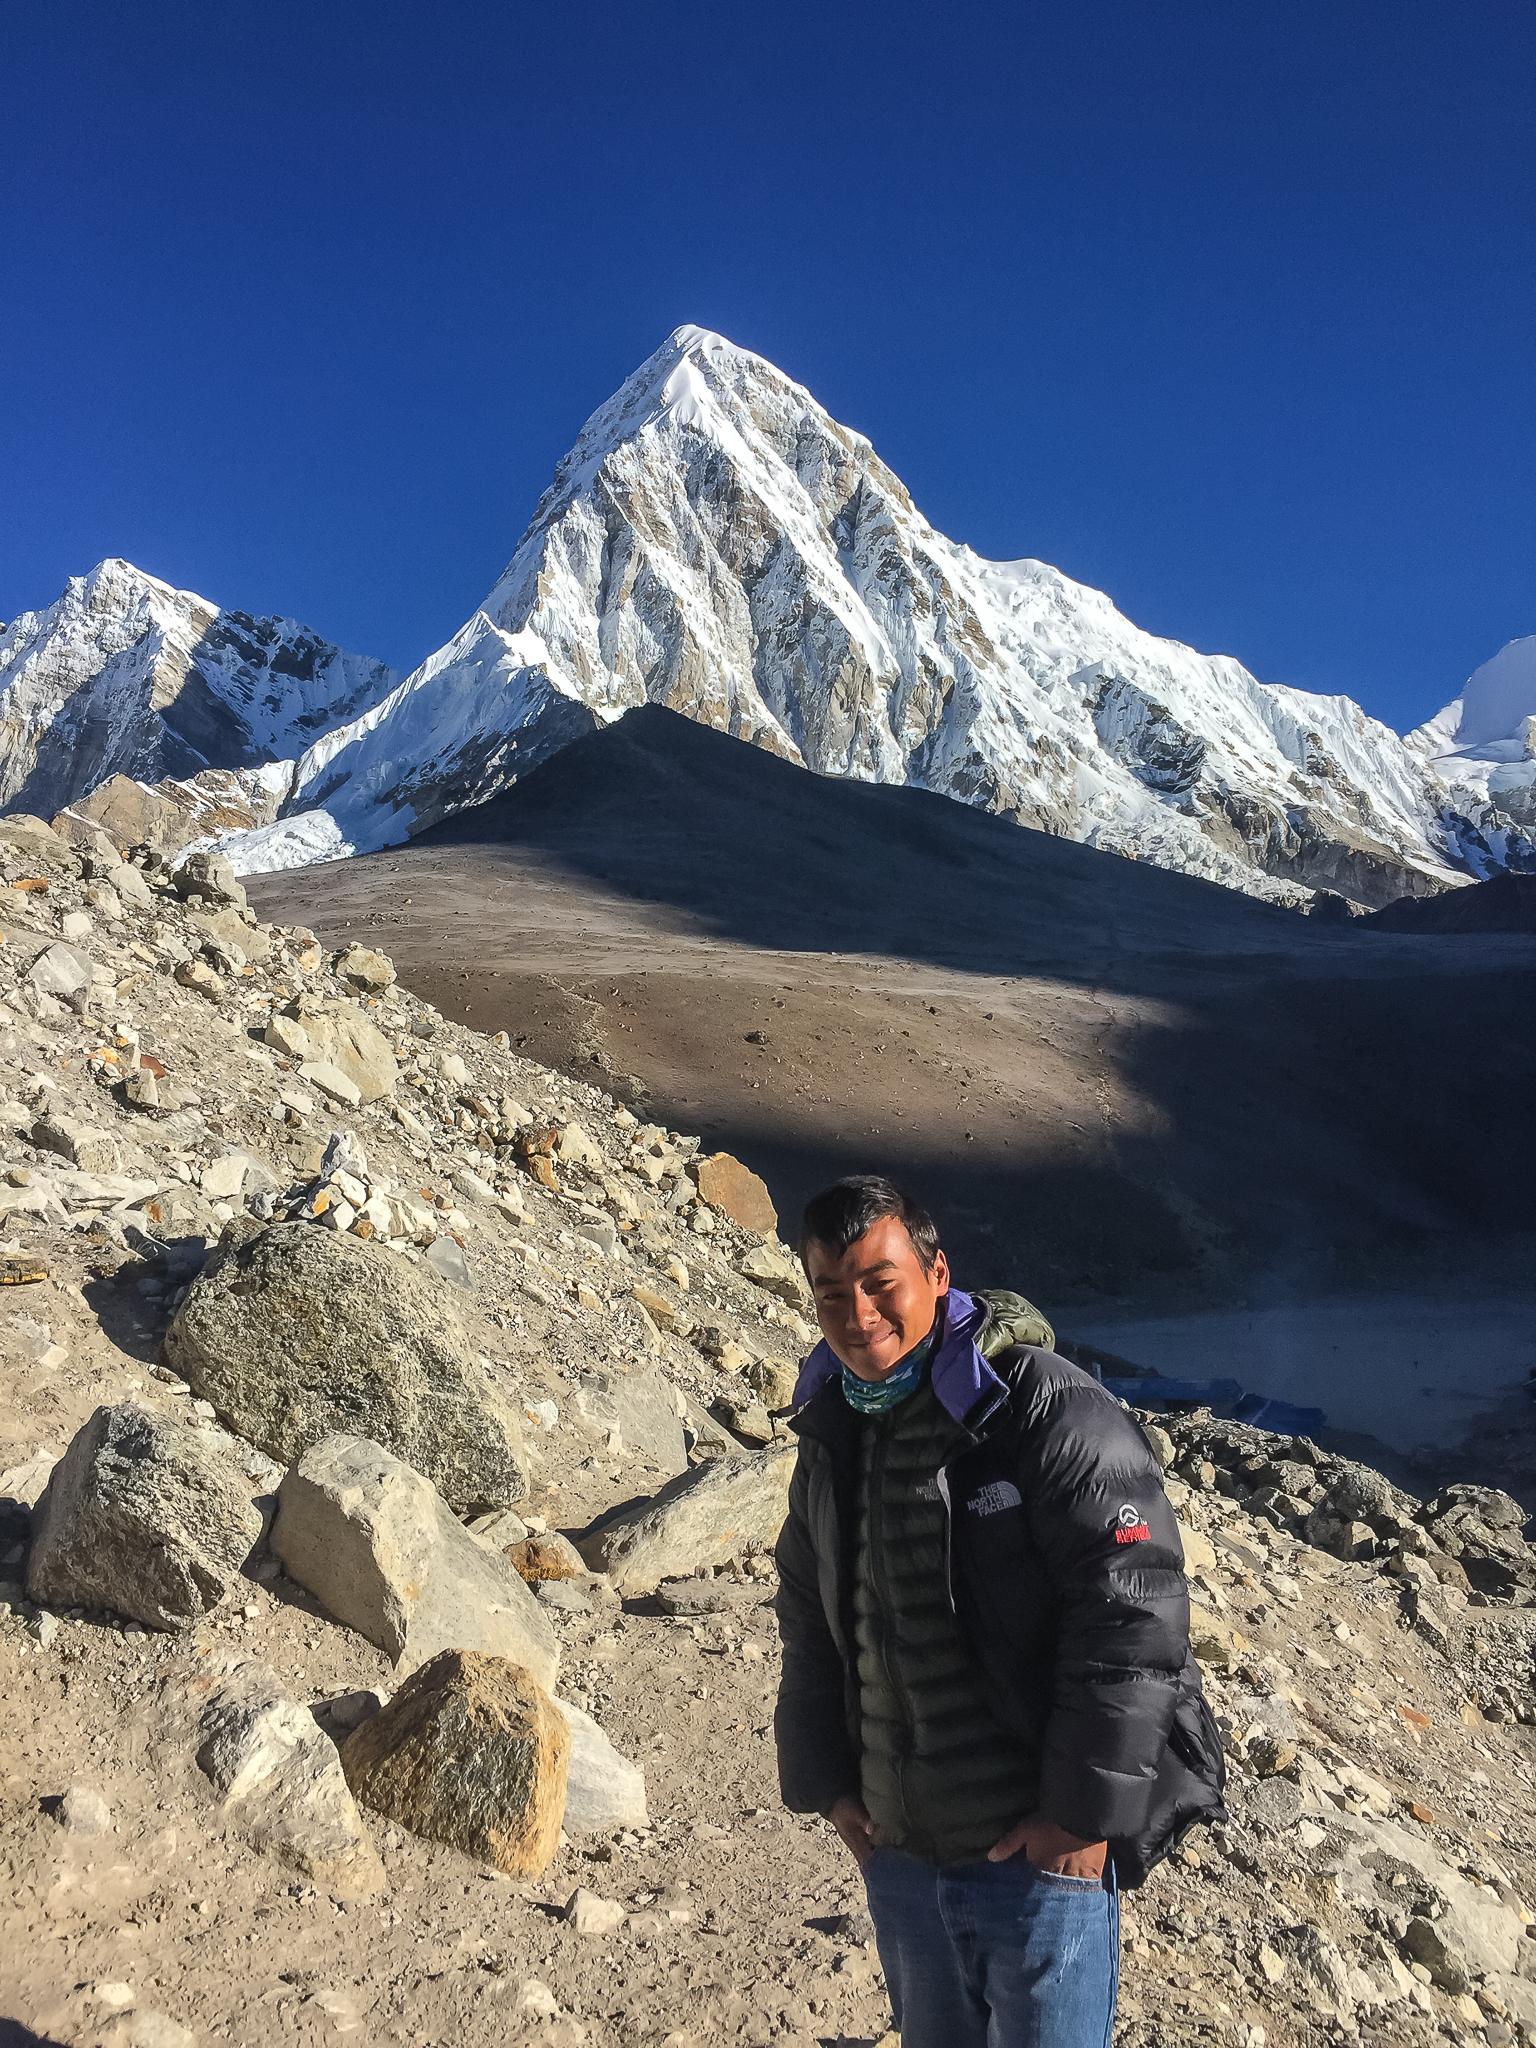 From bottom to top: Sherpa Pemba, edge of Gorakshep (5,164m), darkened hill top of Kalapathar (5,645m), Pumo Ri (7,165m)